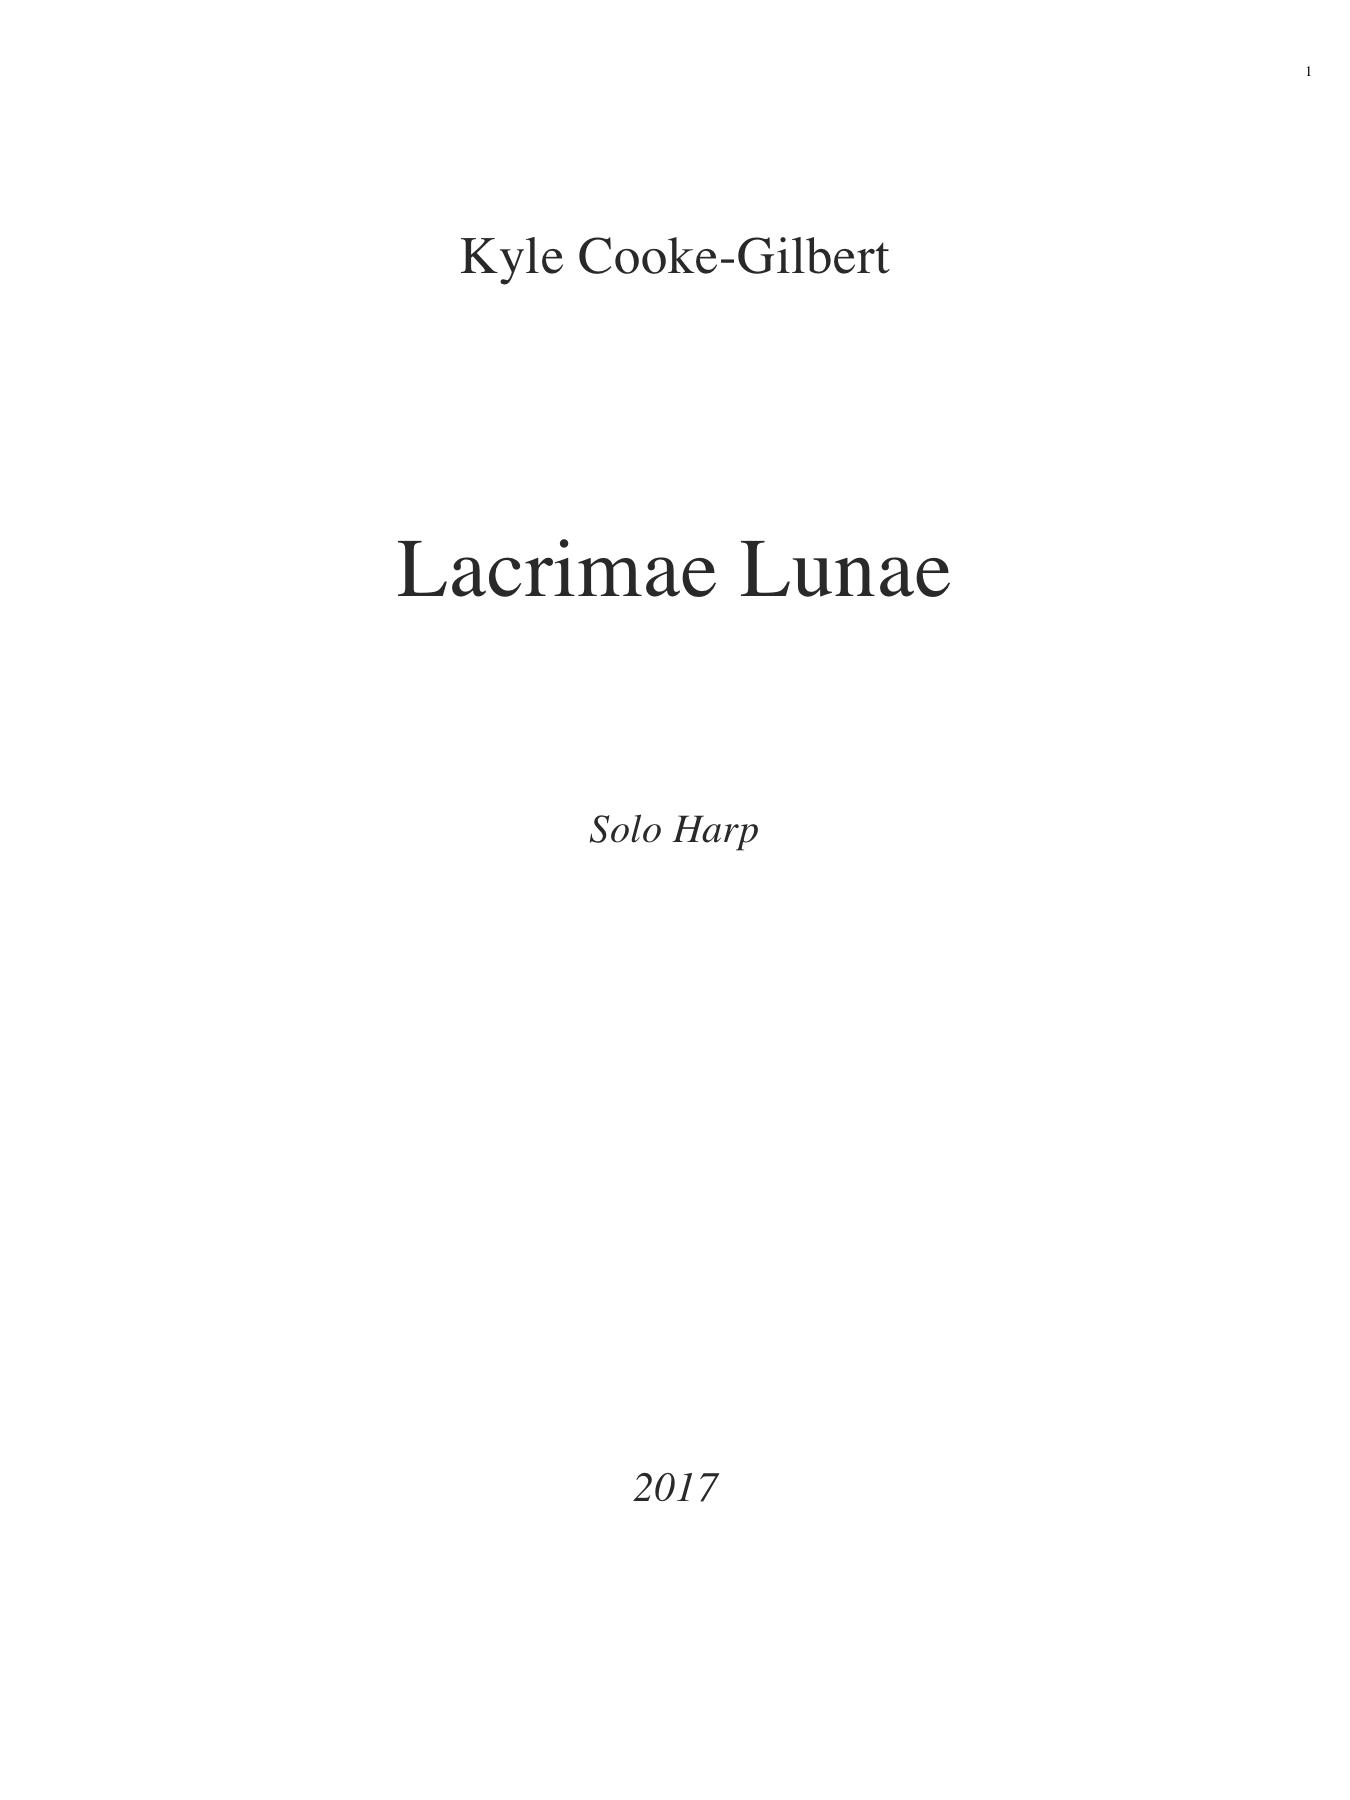 LacrimaeLunae.png